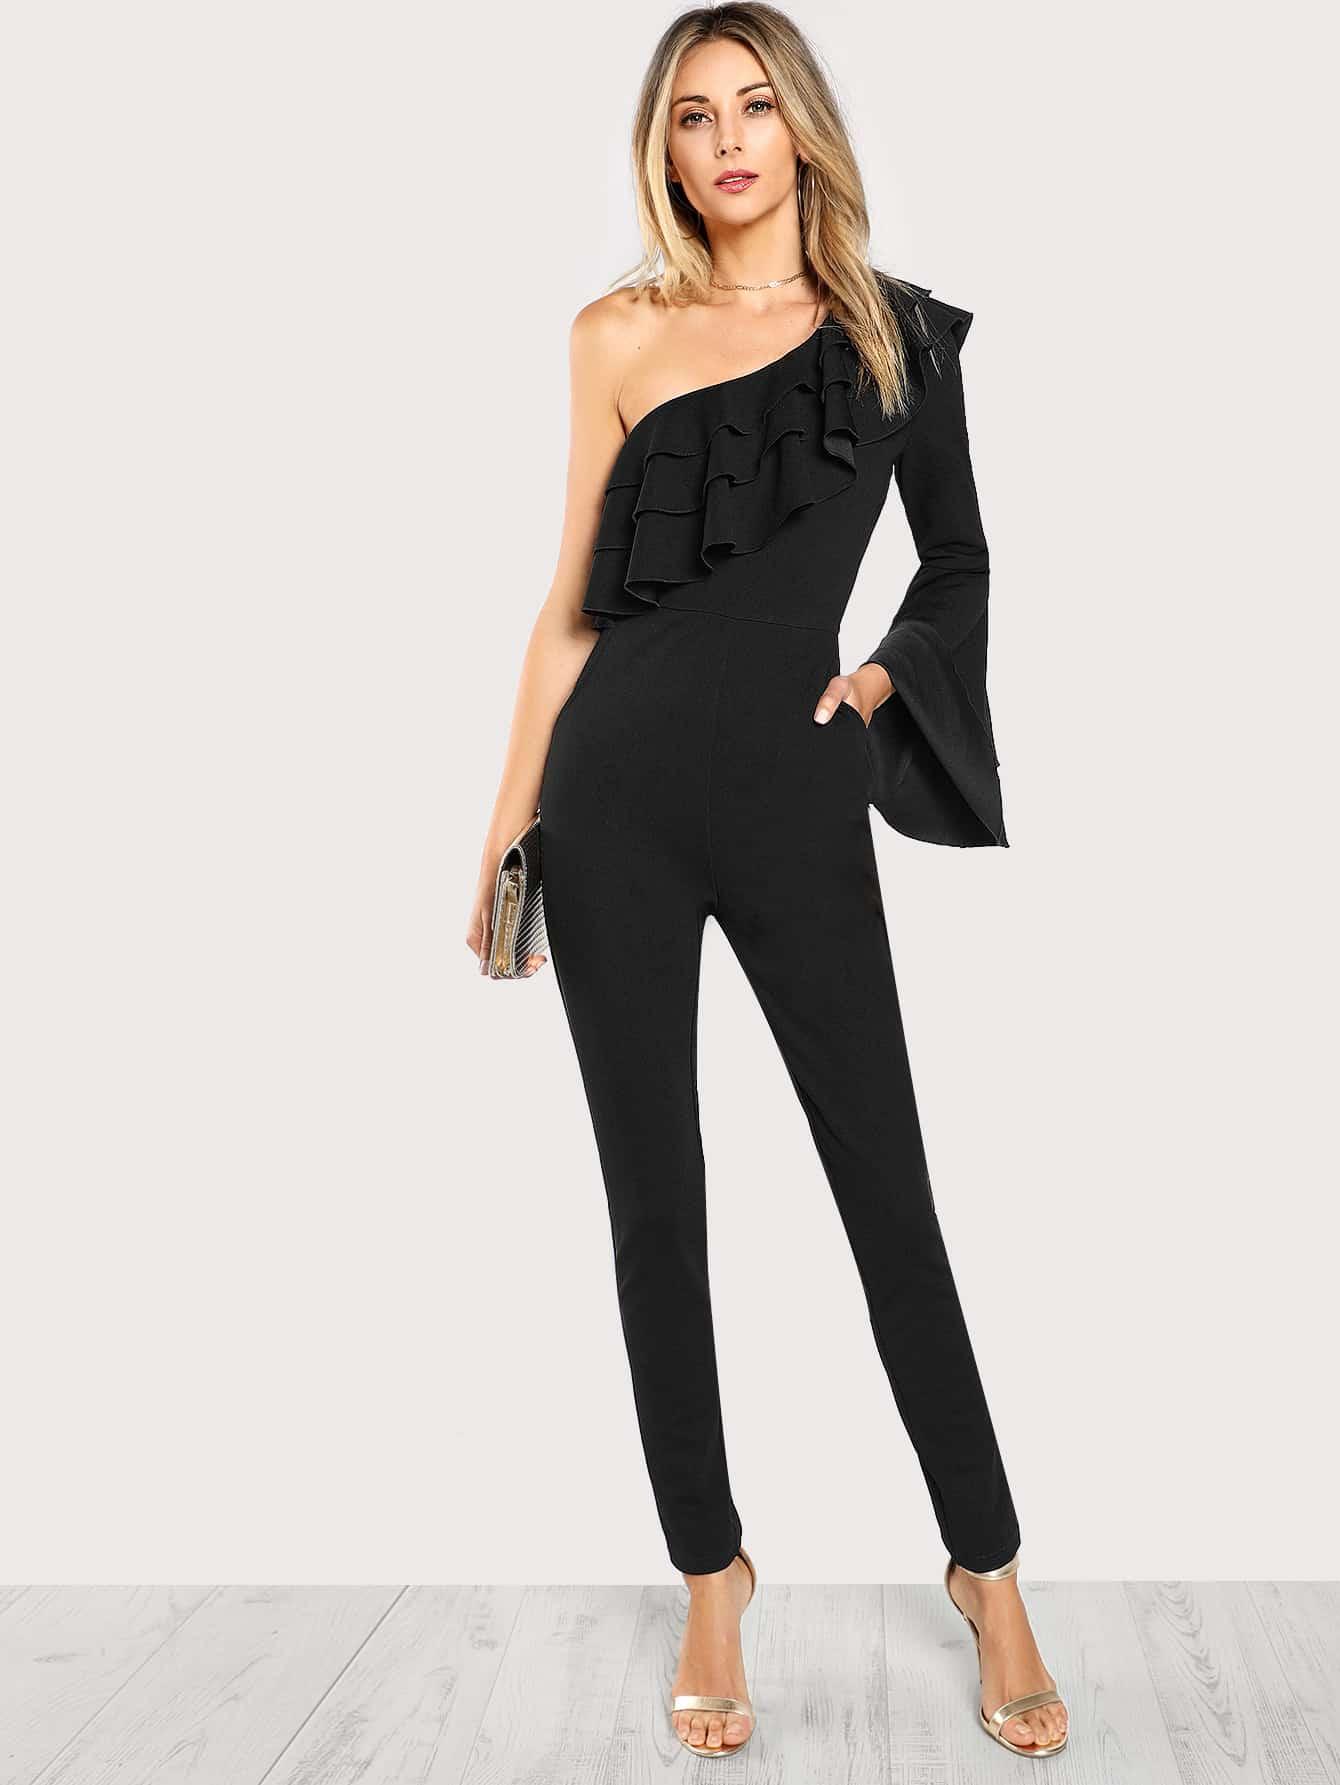 Asymmetrical Shoulder Layered Bell Sleeve Jumpsuit black one shoulder frill layered design jumpsuit